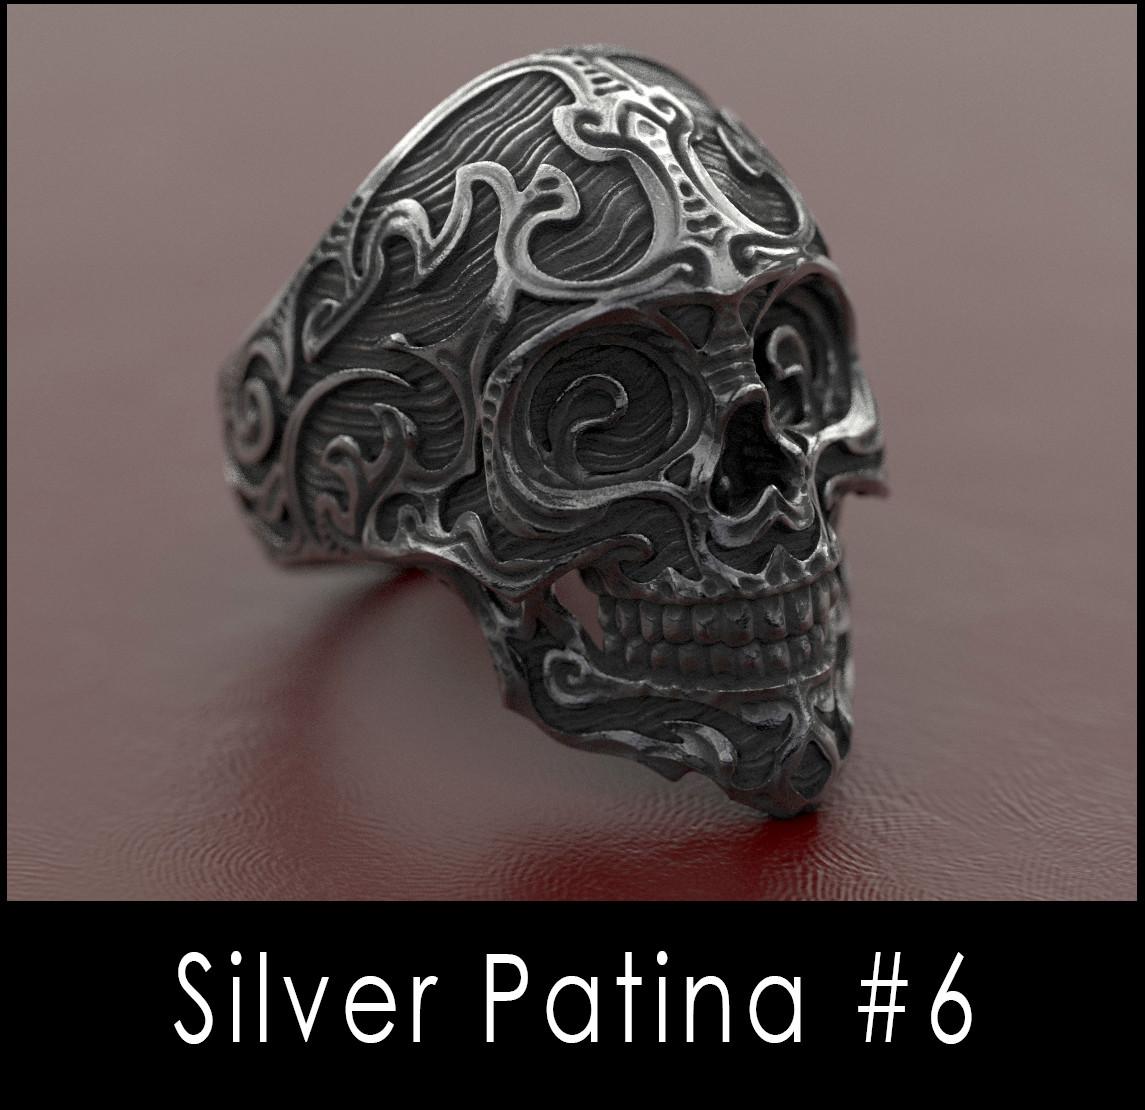 Nacho riesco gostanza silver patina n6